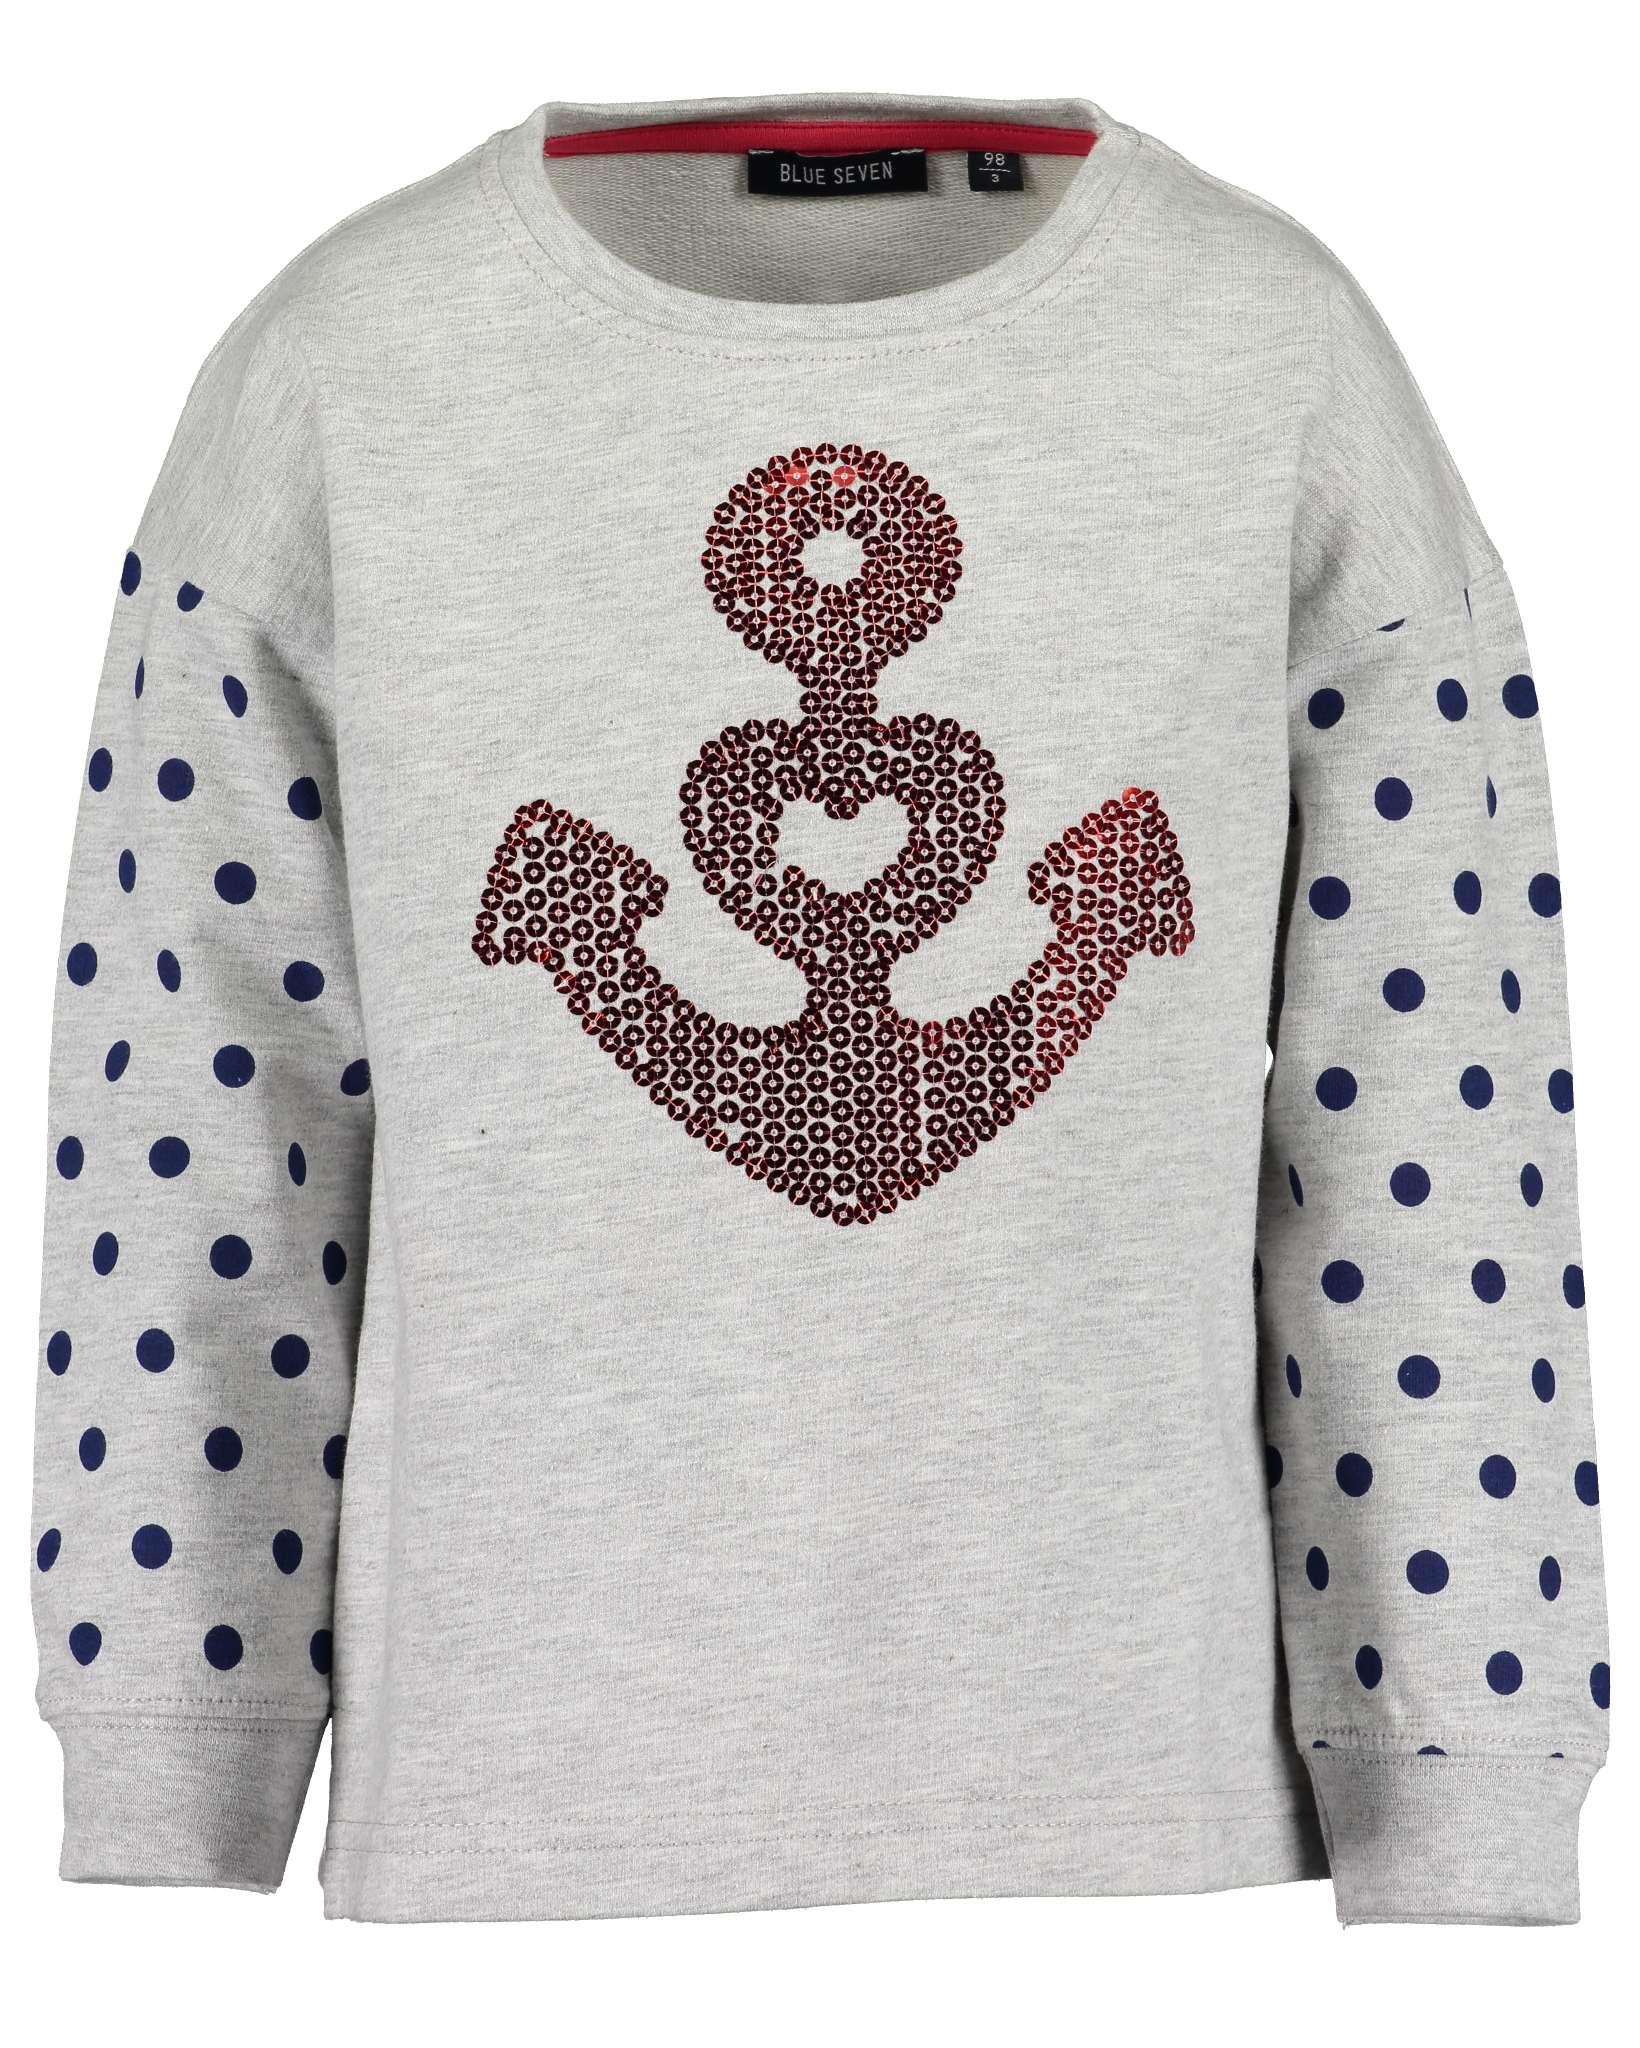 Sweatshirt 116 nebel Blue Seven